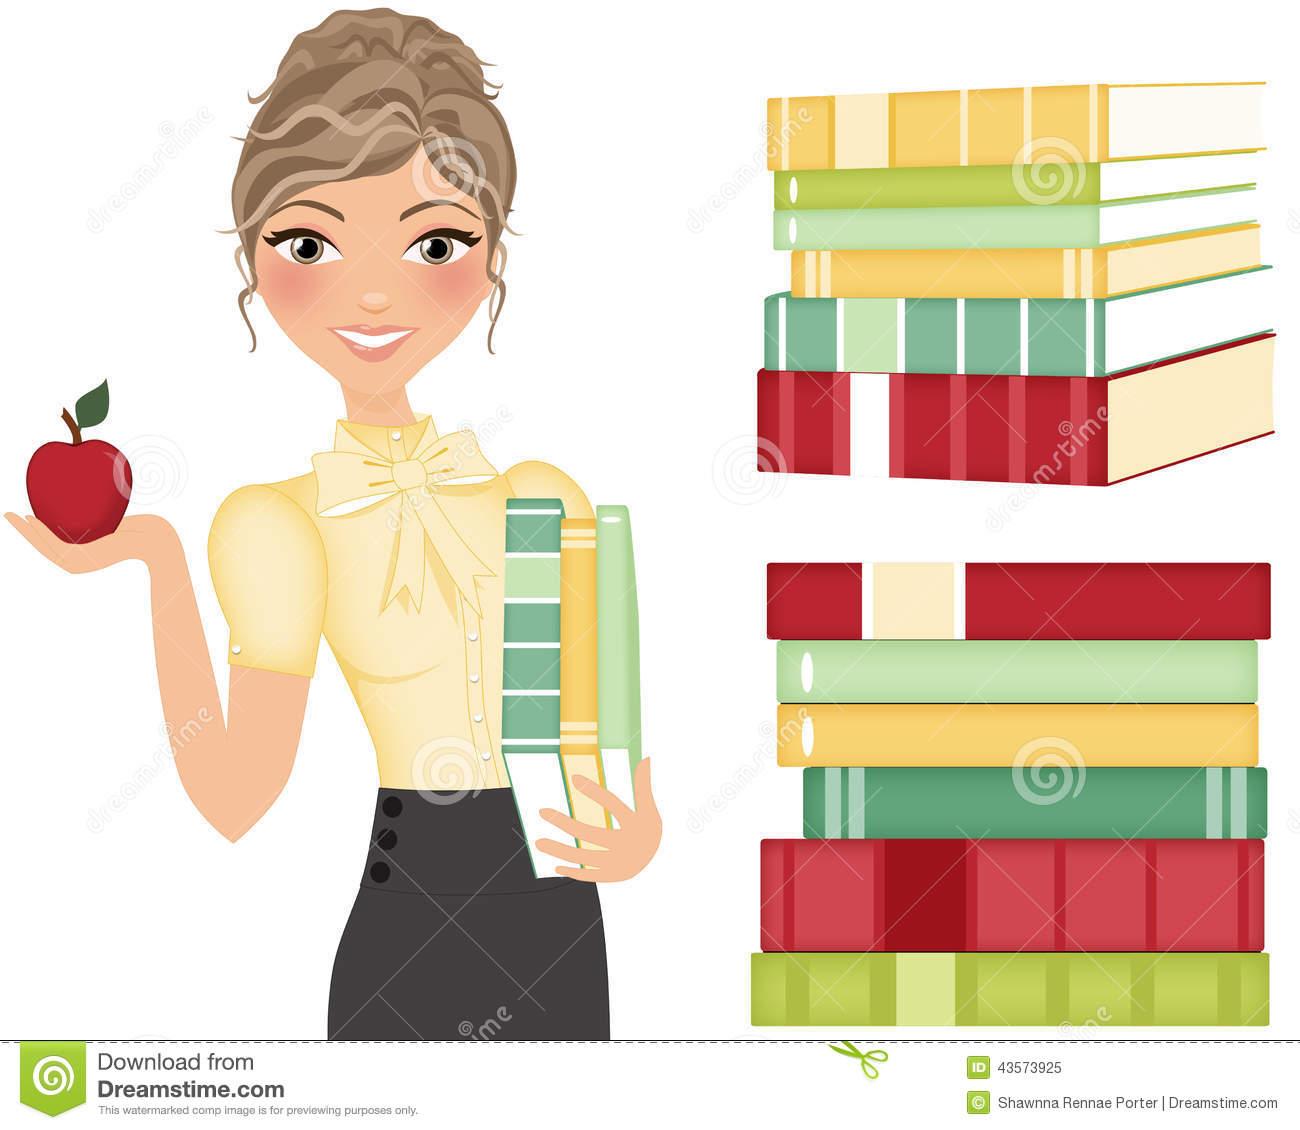 Clip art books for teachers jpg freeuse library Teacher books and apple clipart - ClipartFest jpg freeuse library